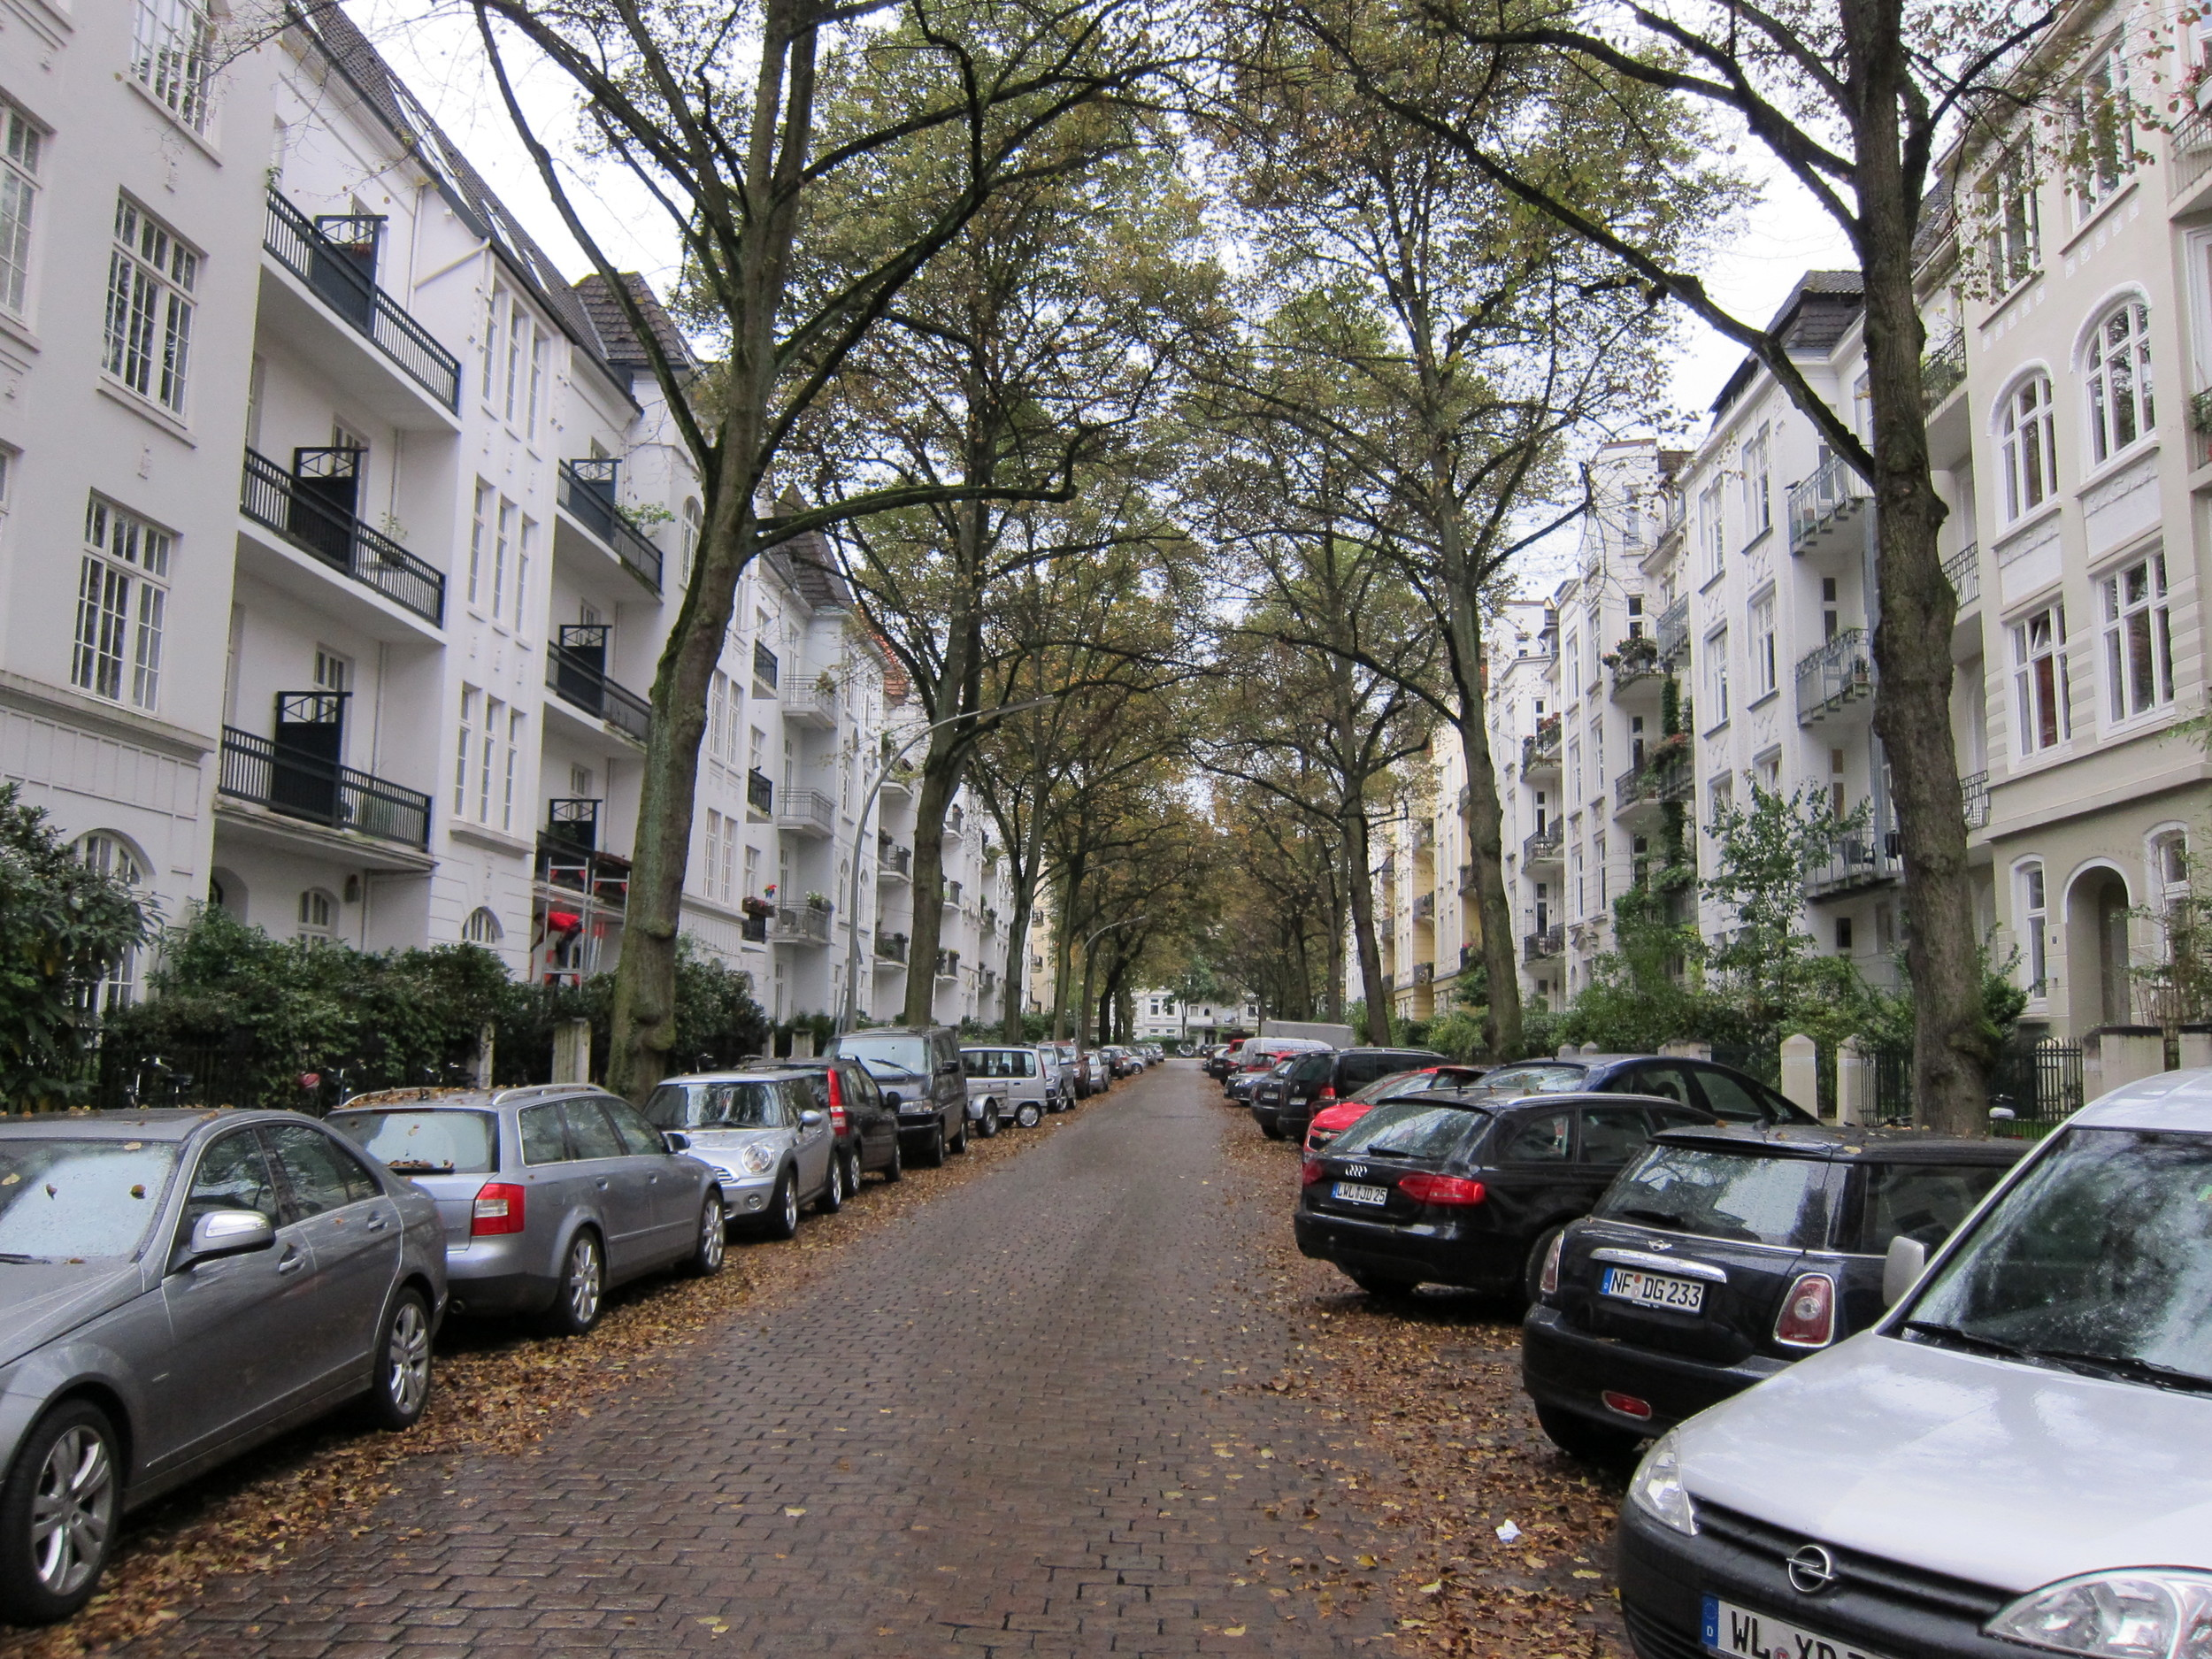 2012, Hamburg, where I lived for two weeks.